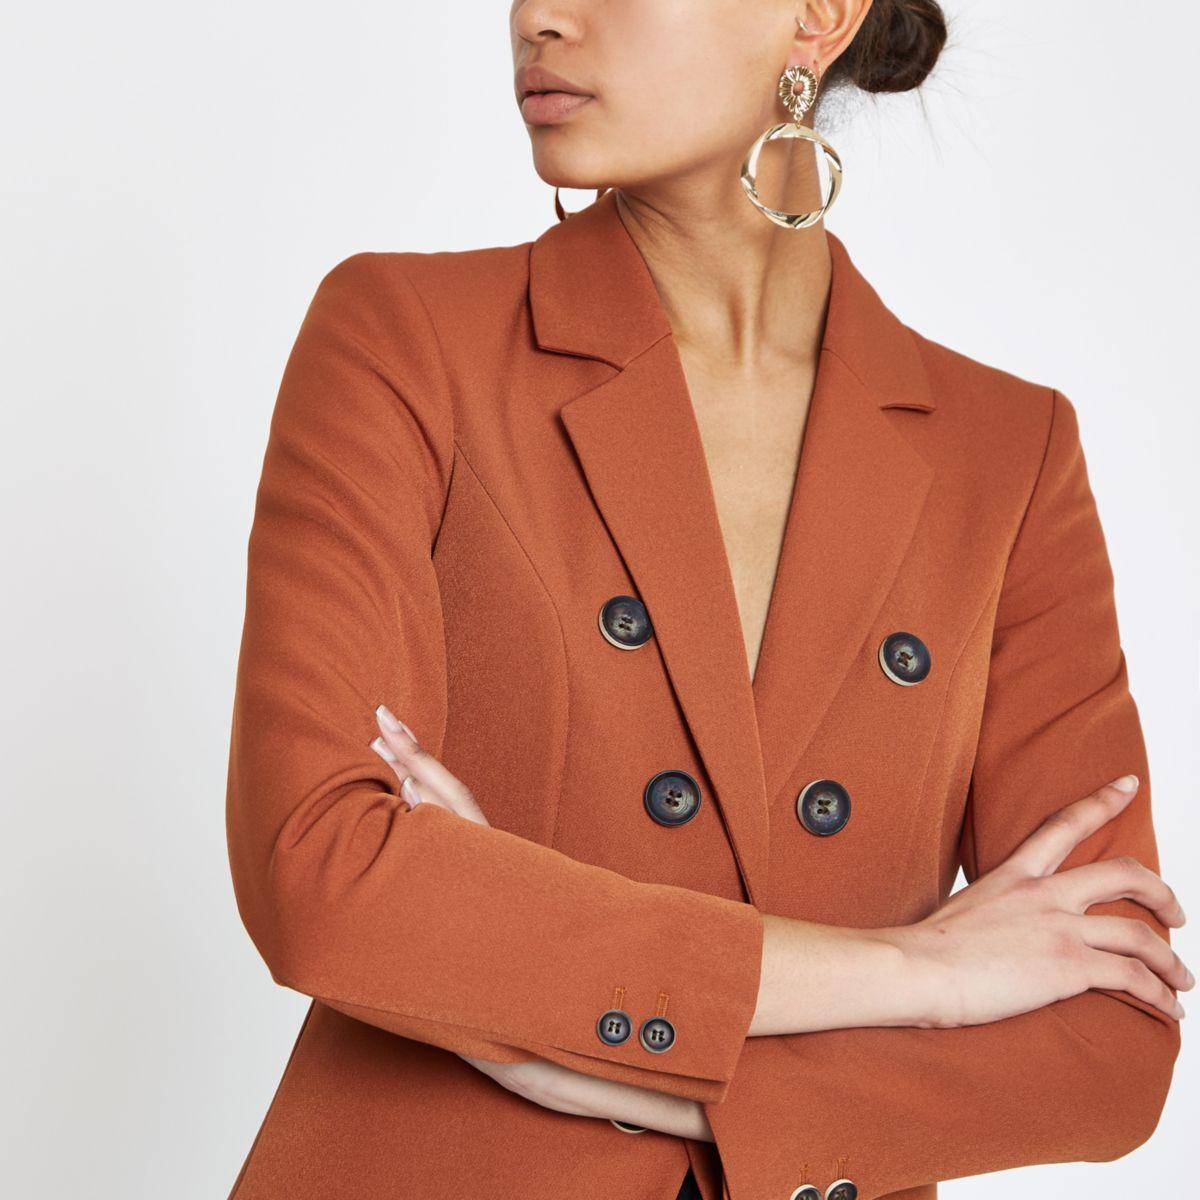 Copper button front blazer